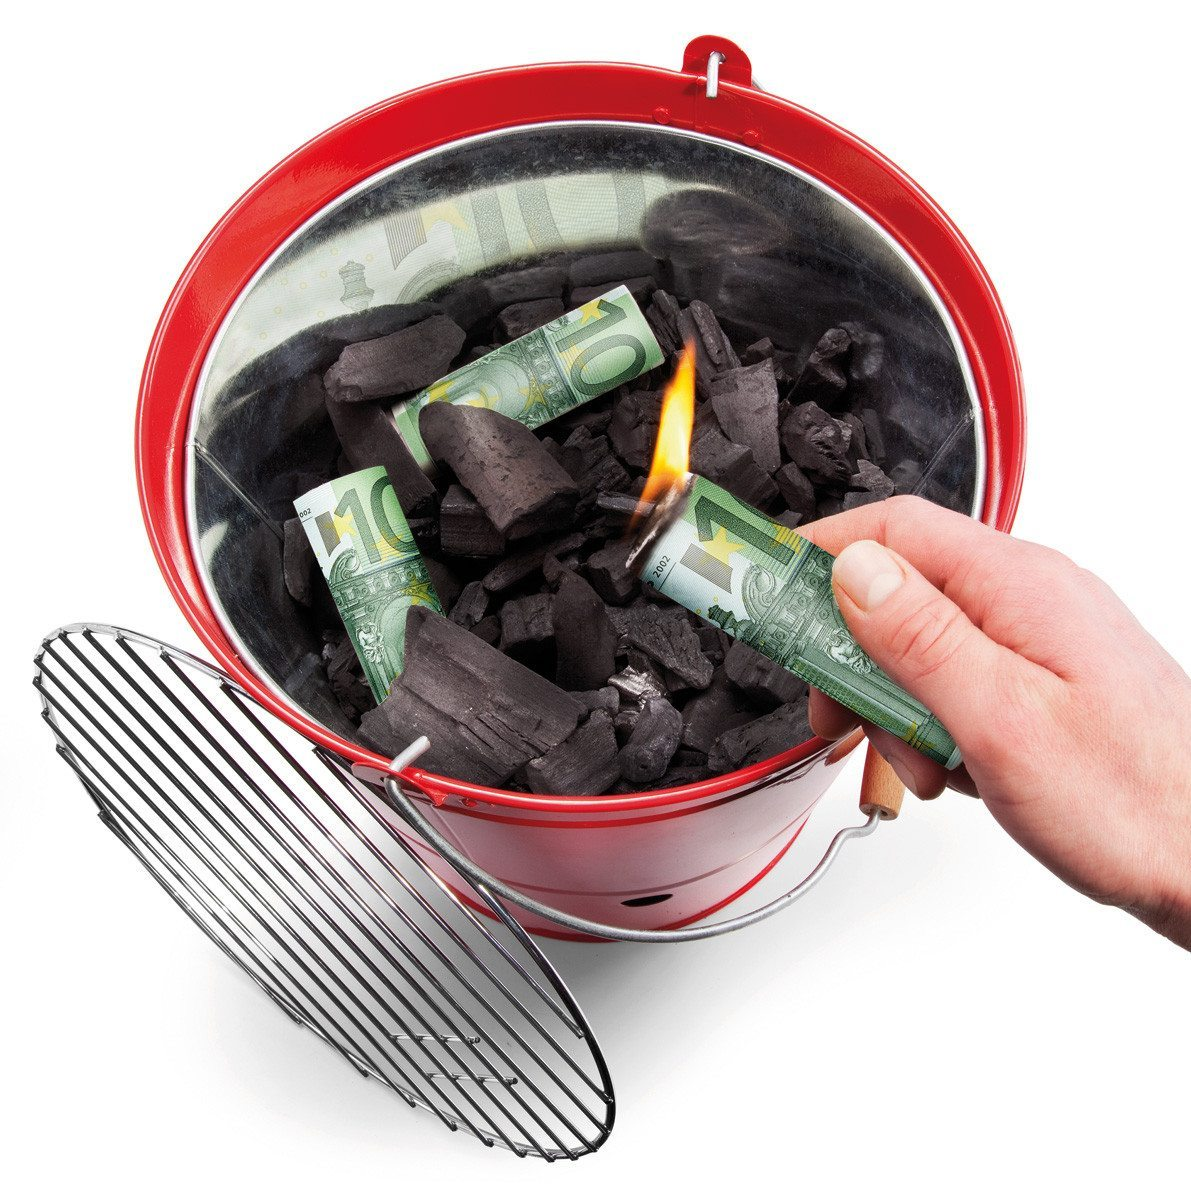 Burn Your Money grillisytykkeet